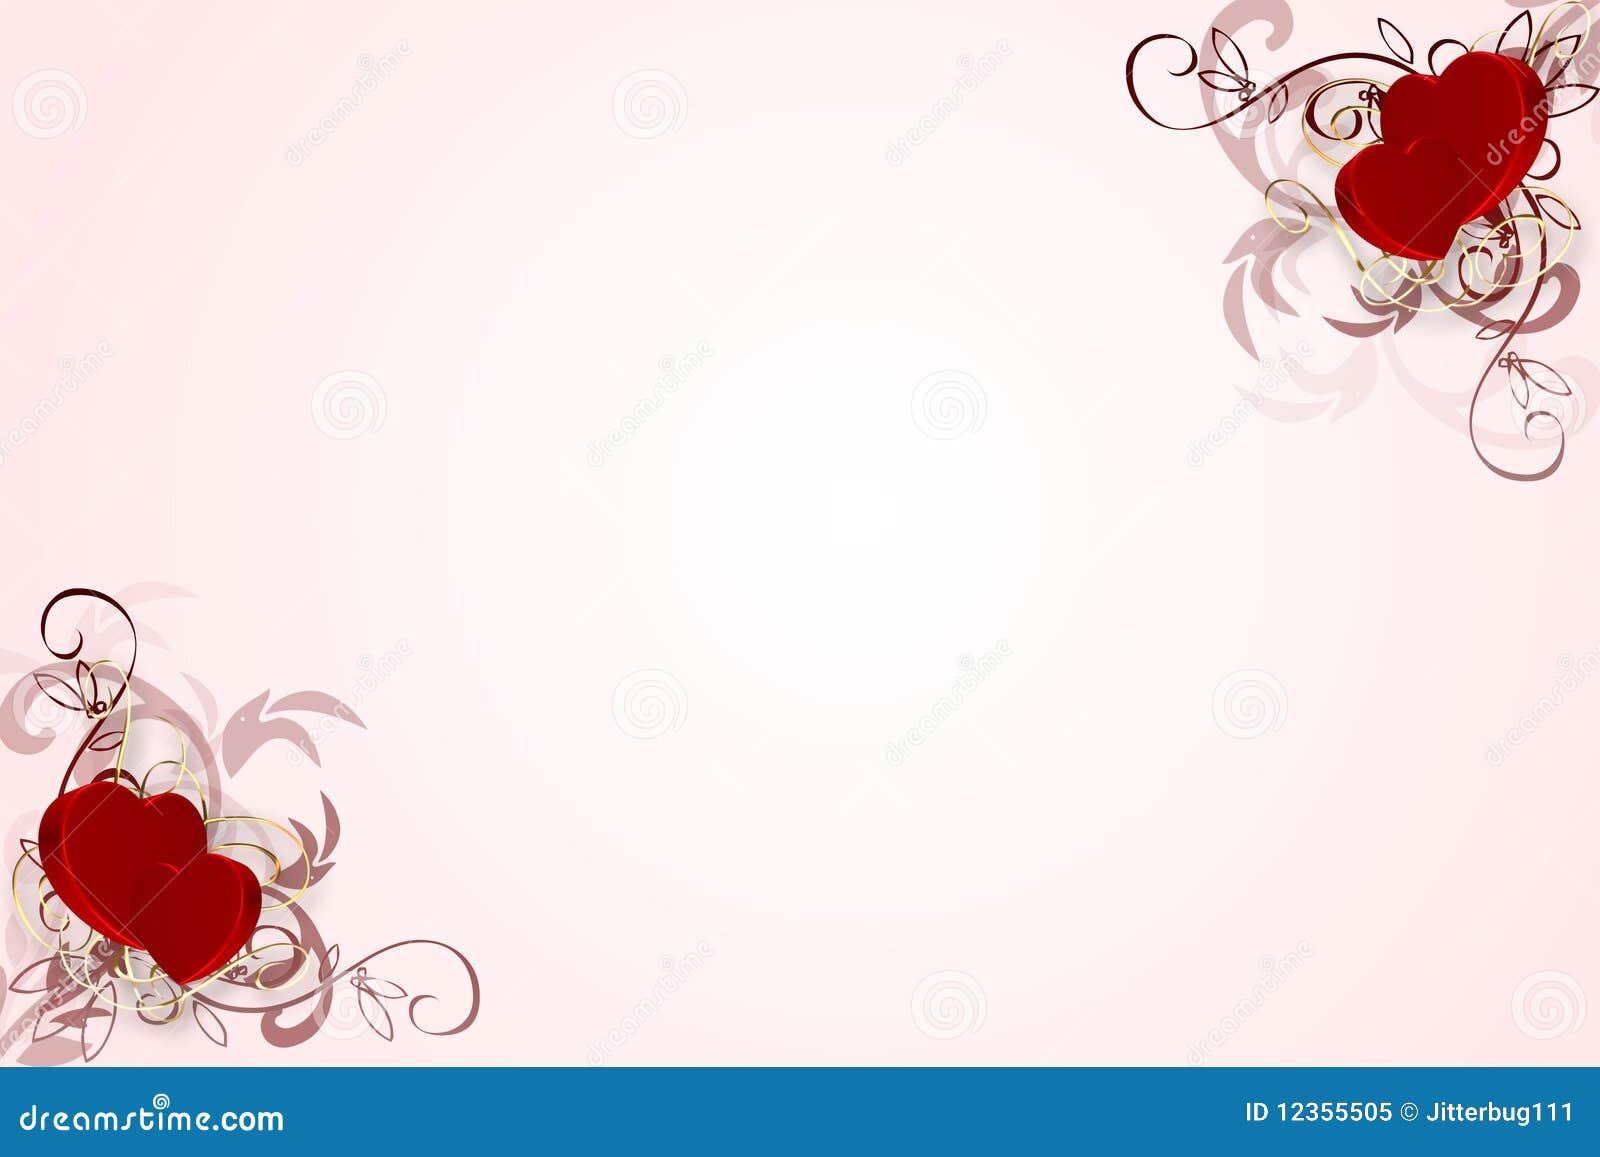 ppt 背景 背景图片 壁纸 边框 模板 设计 相框 1300_957